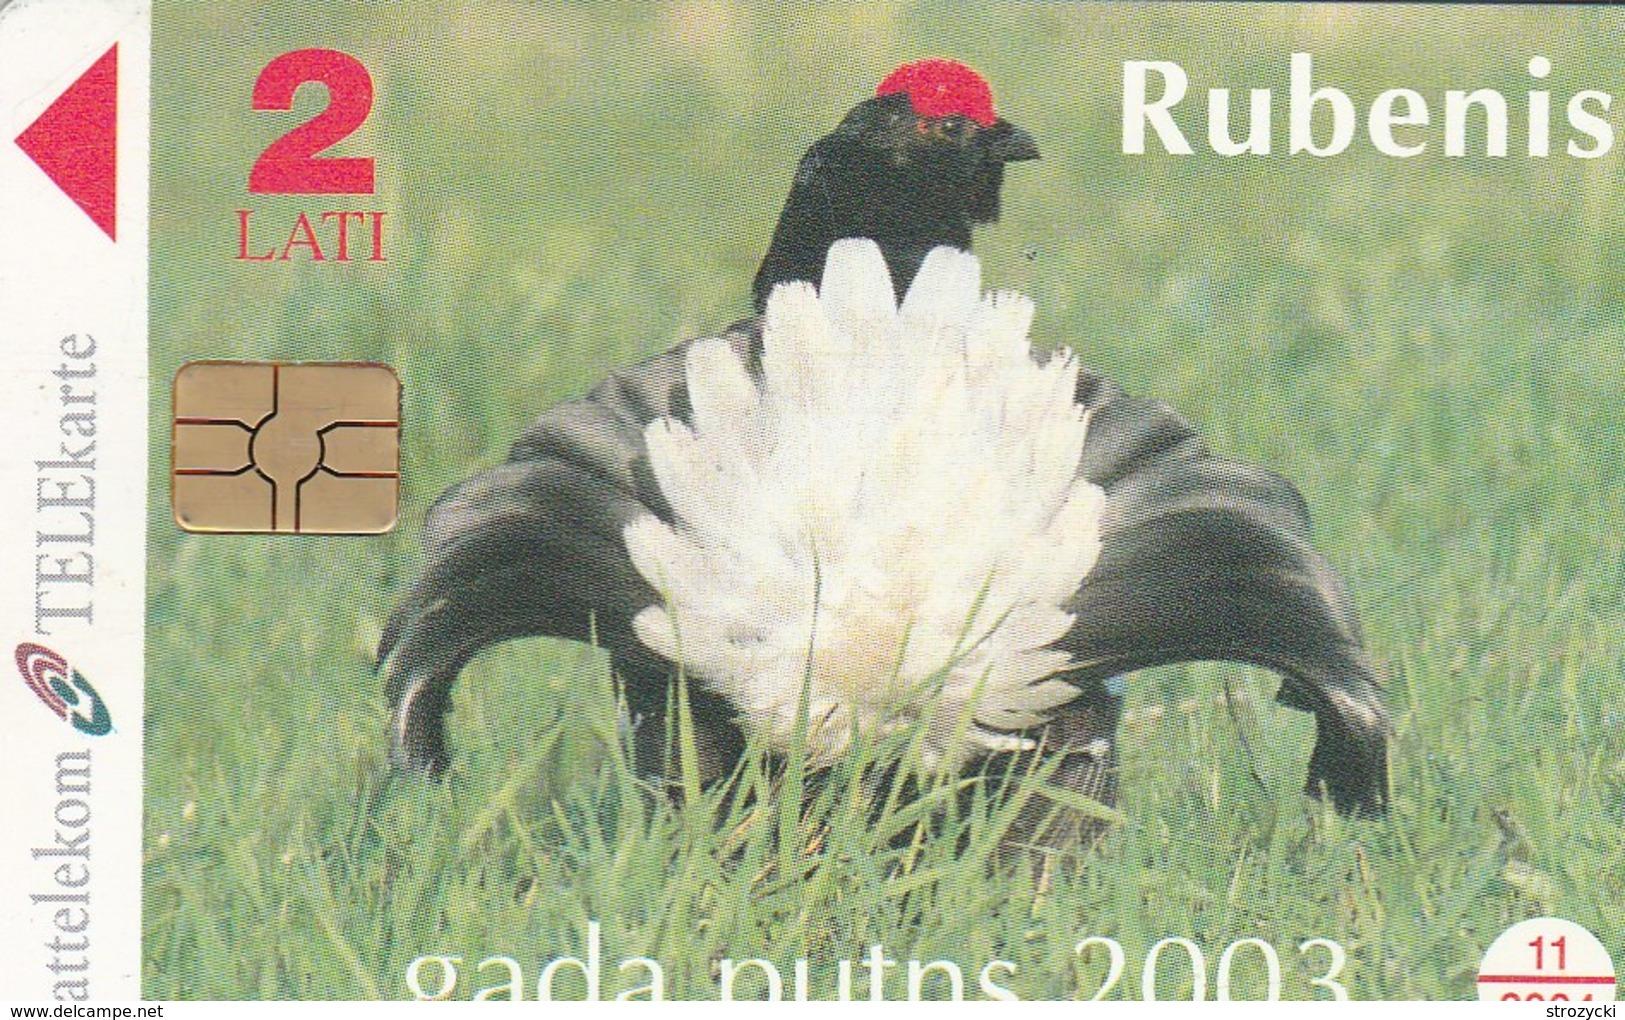 Latvia - Black Grouse - The Bird Of The Year 2003 - 2 - Latvia